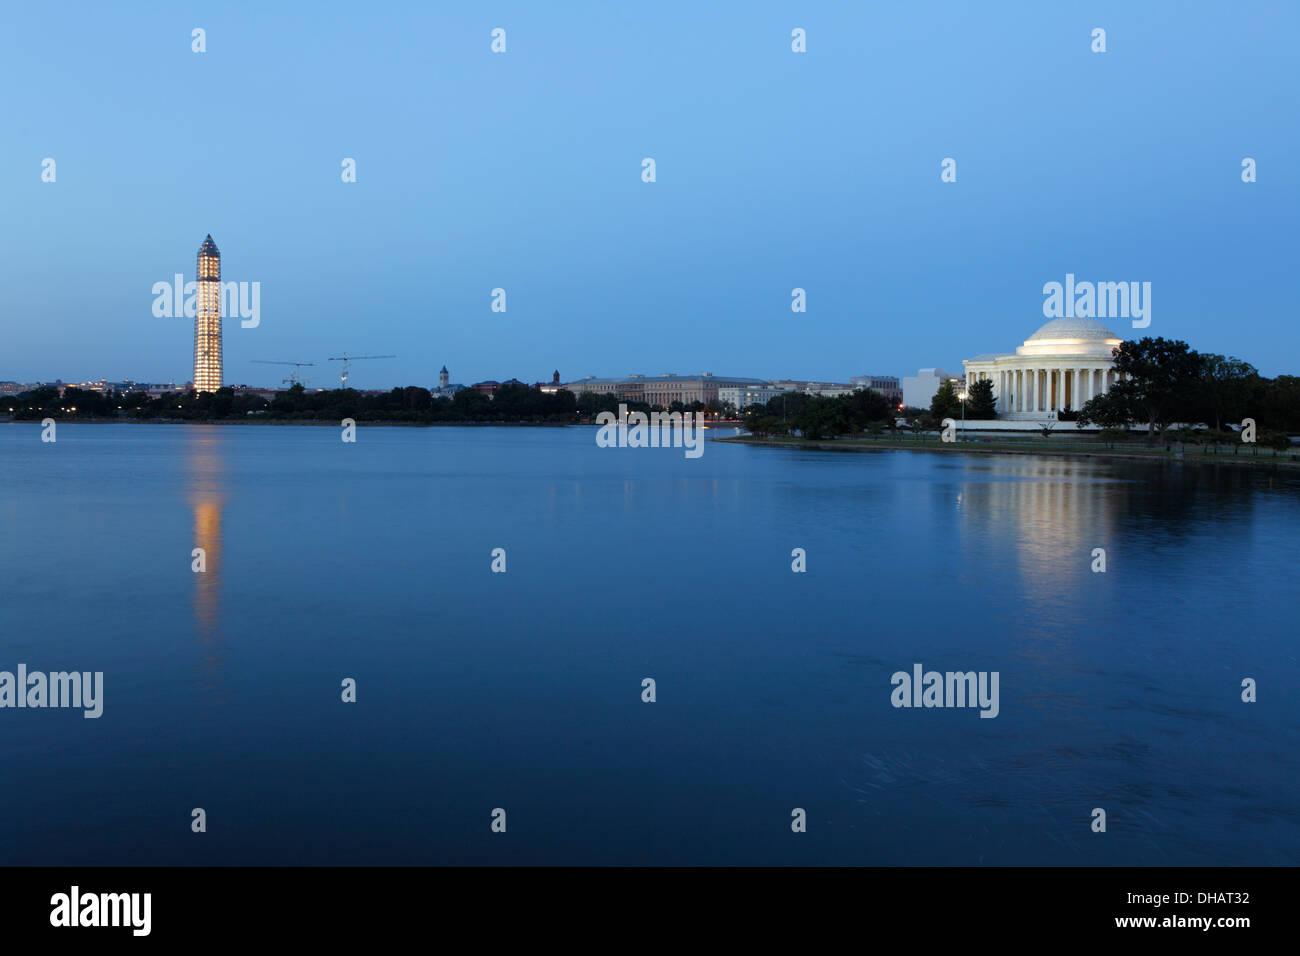 Thomas Jefferson Memorial in Washington D.C., USA - Stock Image